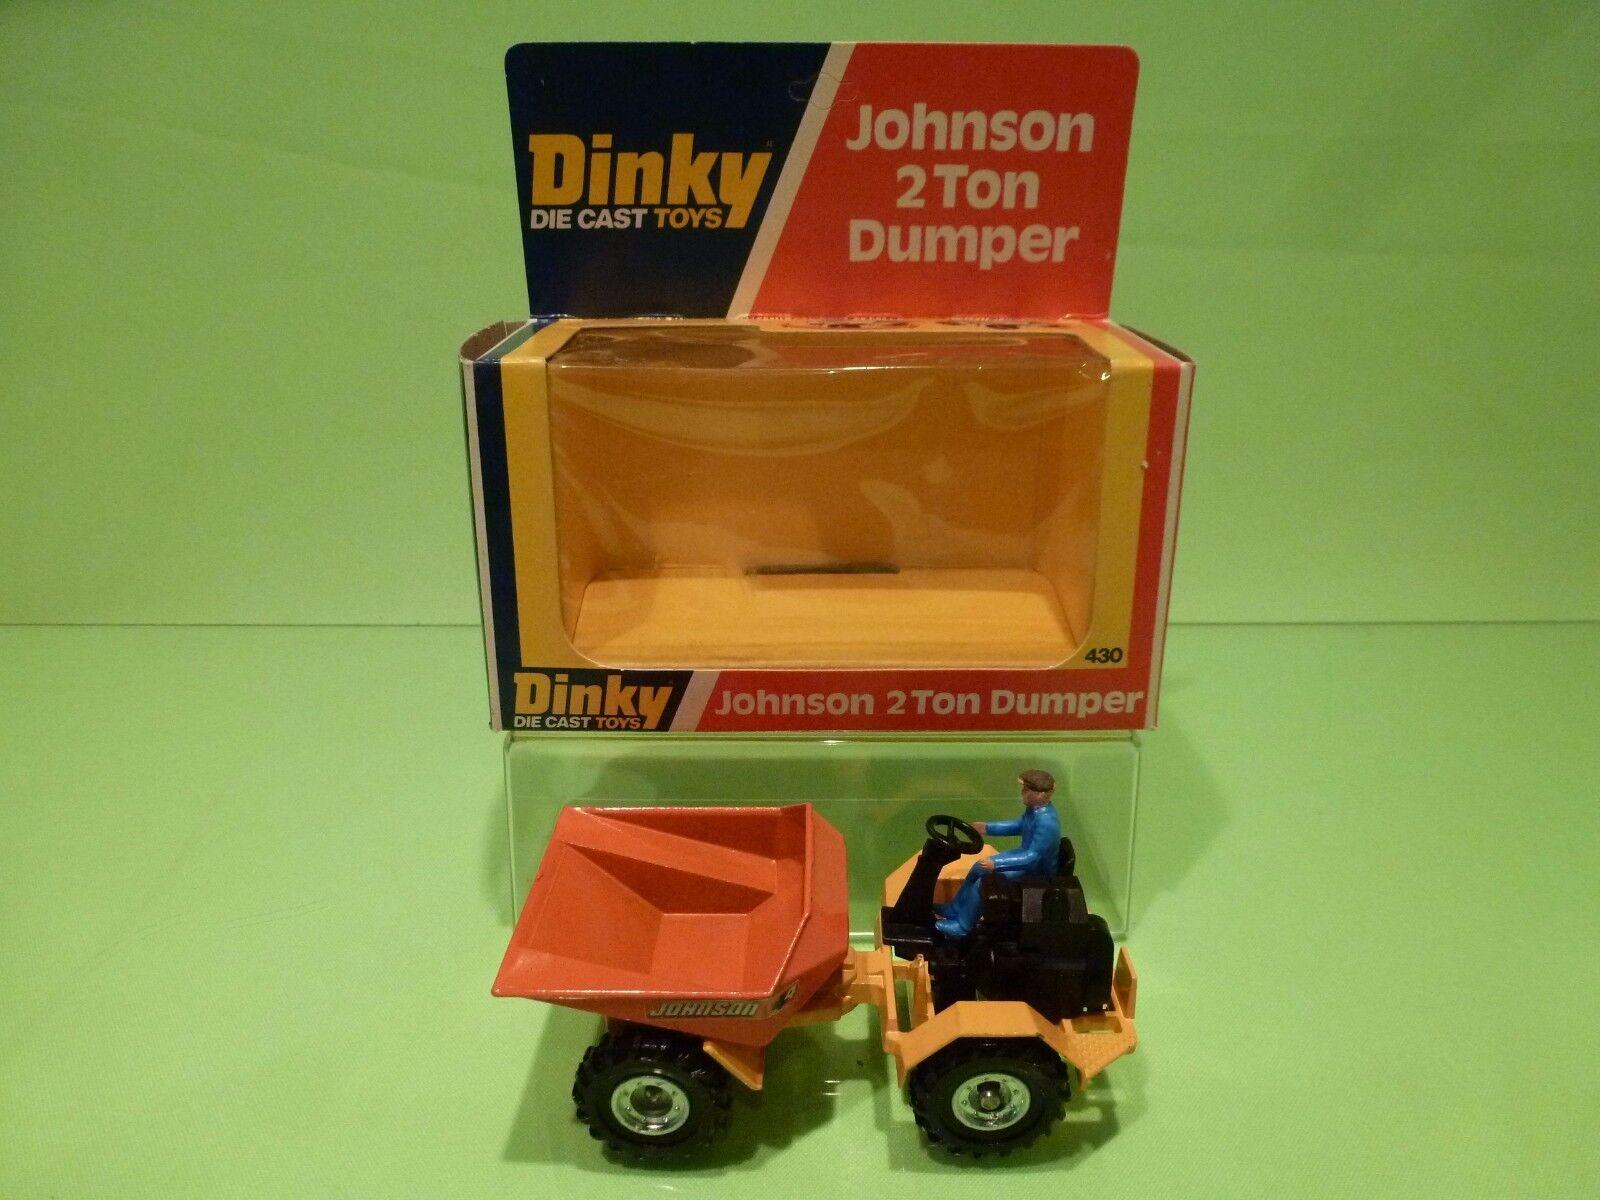 DINKY TOYS 430 JOHNSON 2TON DUMPER - amarillo + naranja - GOOD CONDITION IN BOX